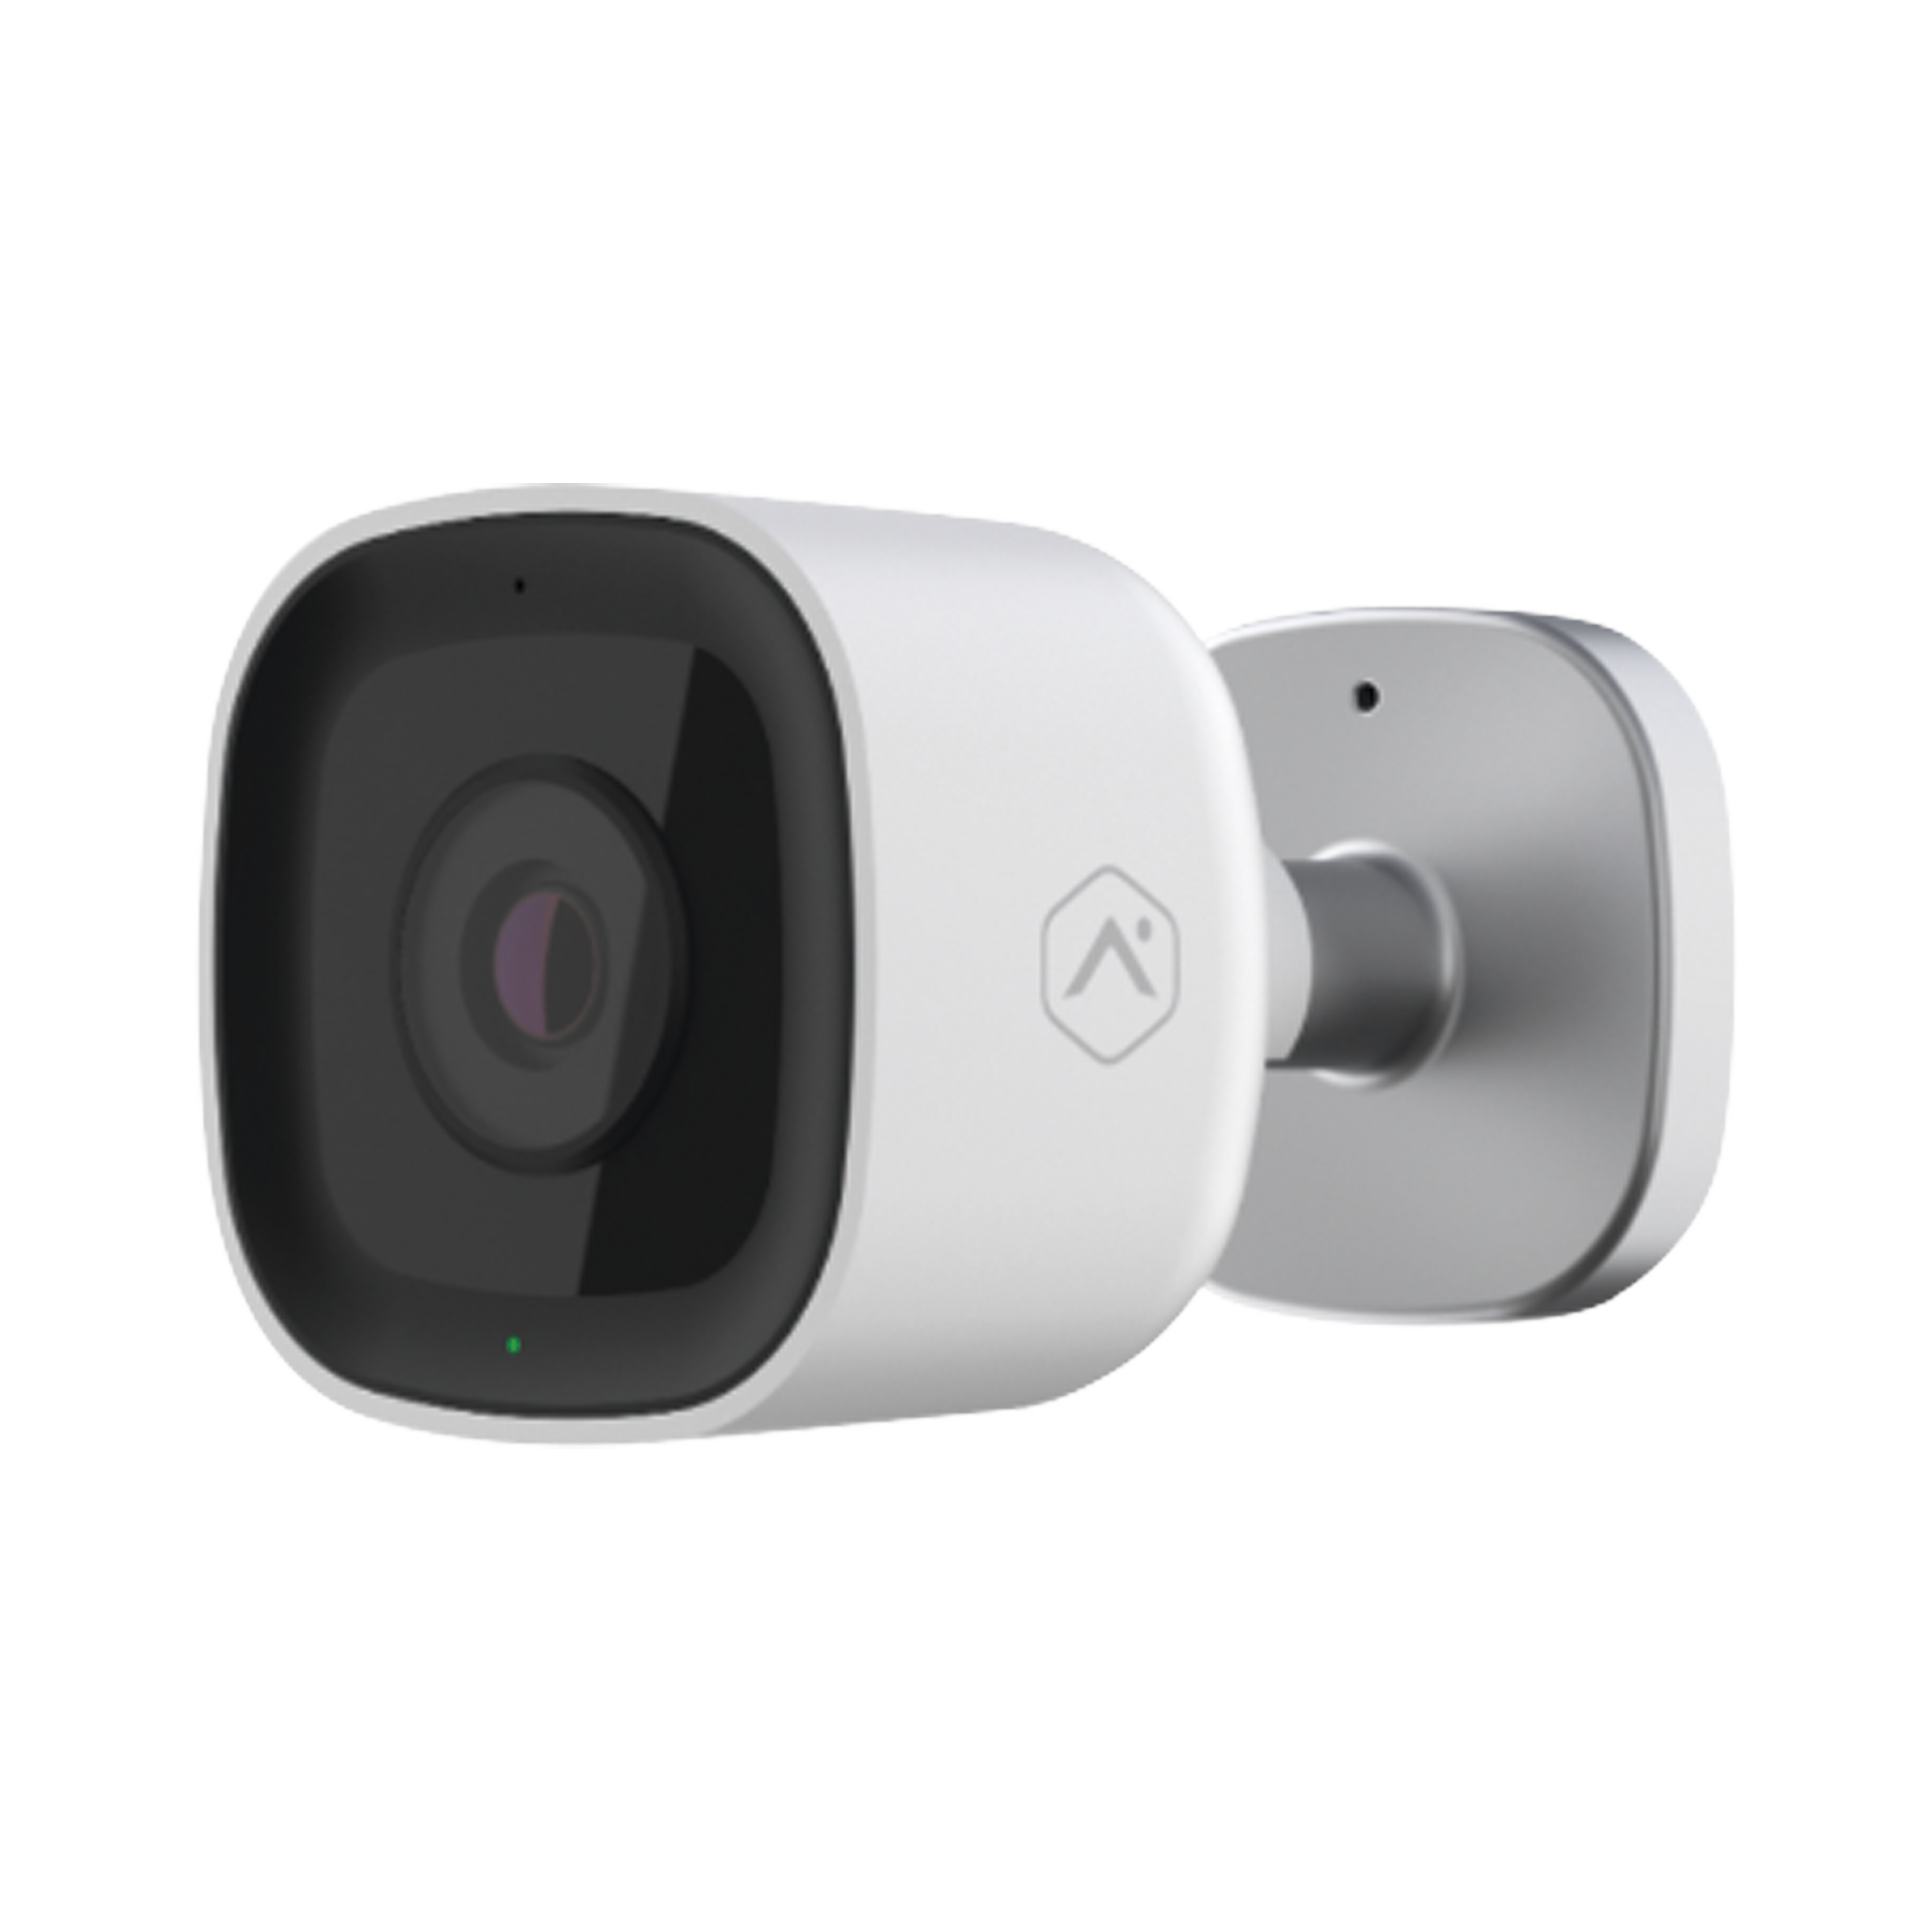 Camara Wi-Fi HD 1080p para Exterior con HDR